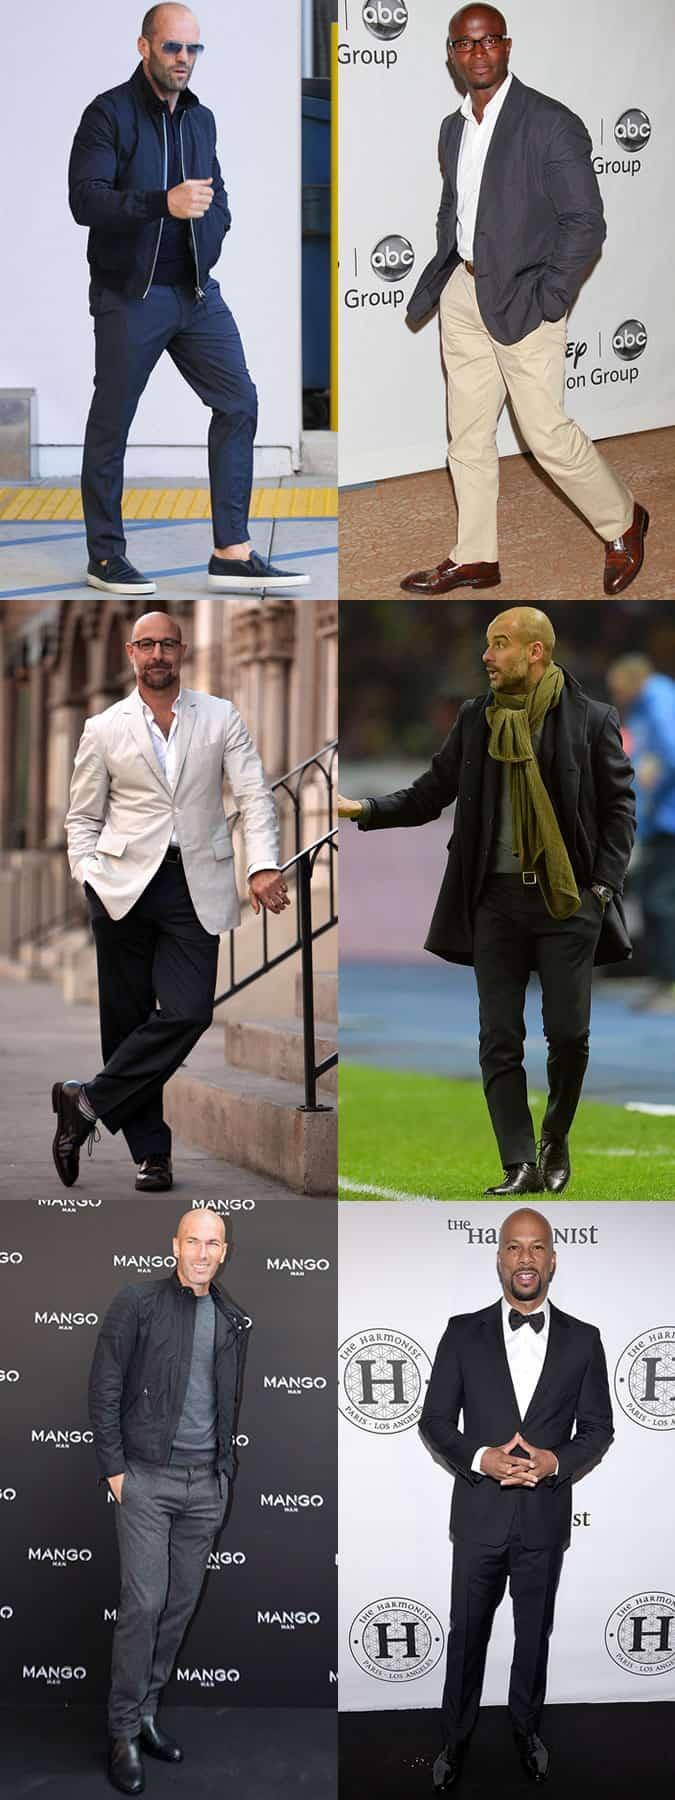 Bald Male Celebrities